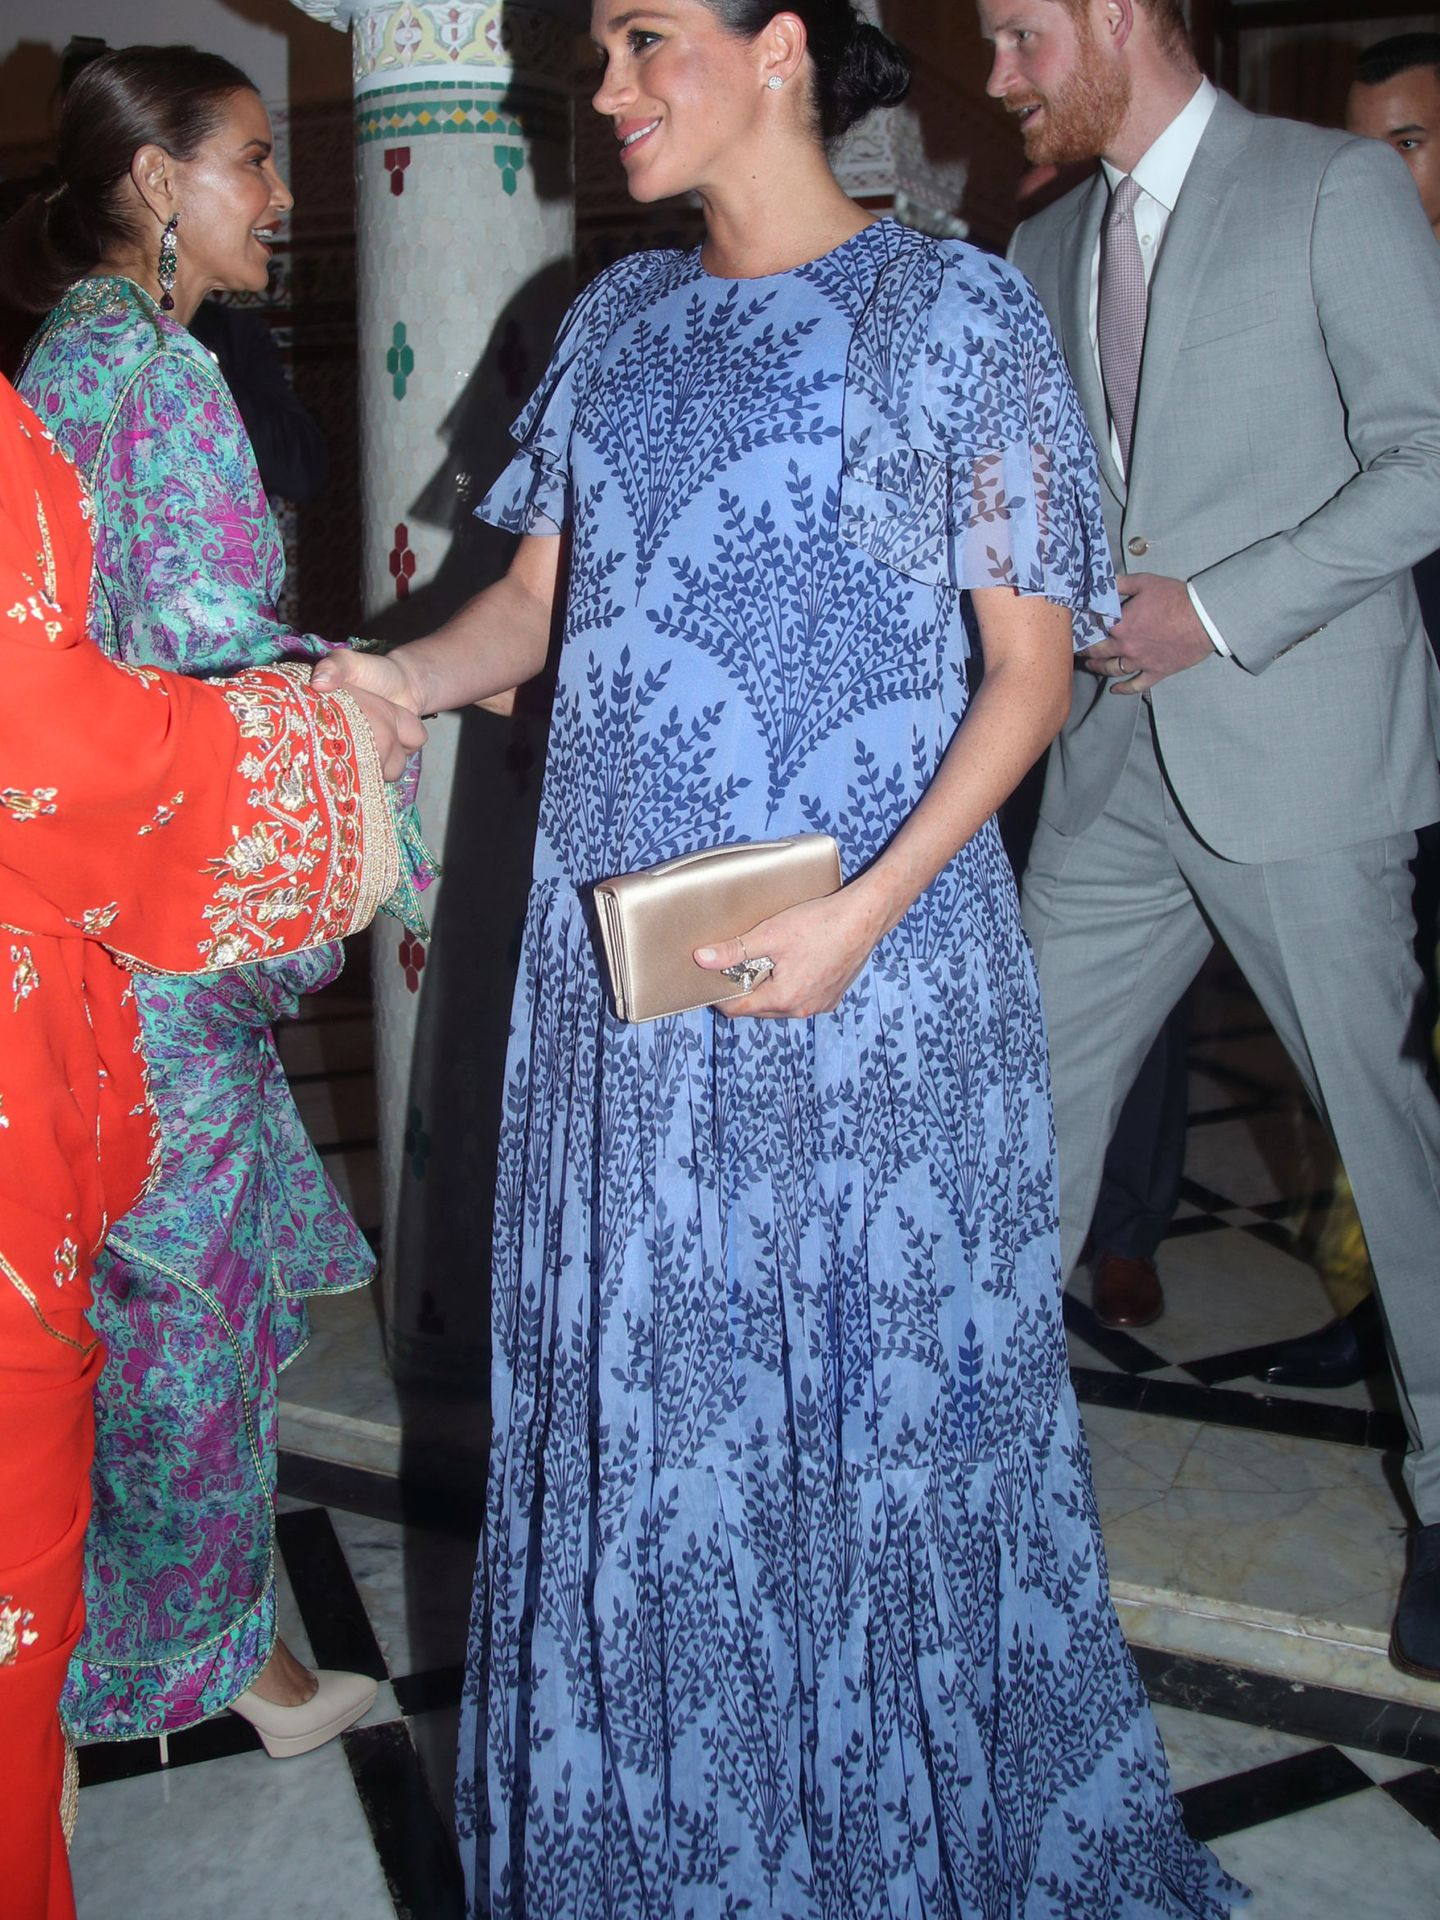 La duquesa de Sussex en la residencia del rey Mohamed VI. (Reuters)